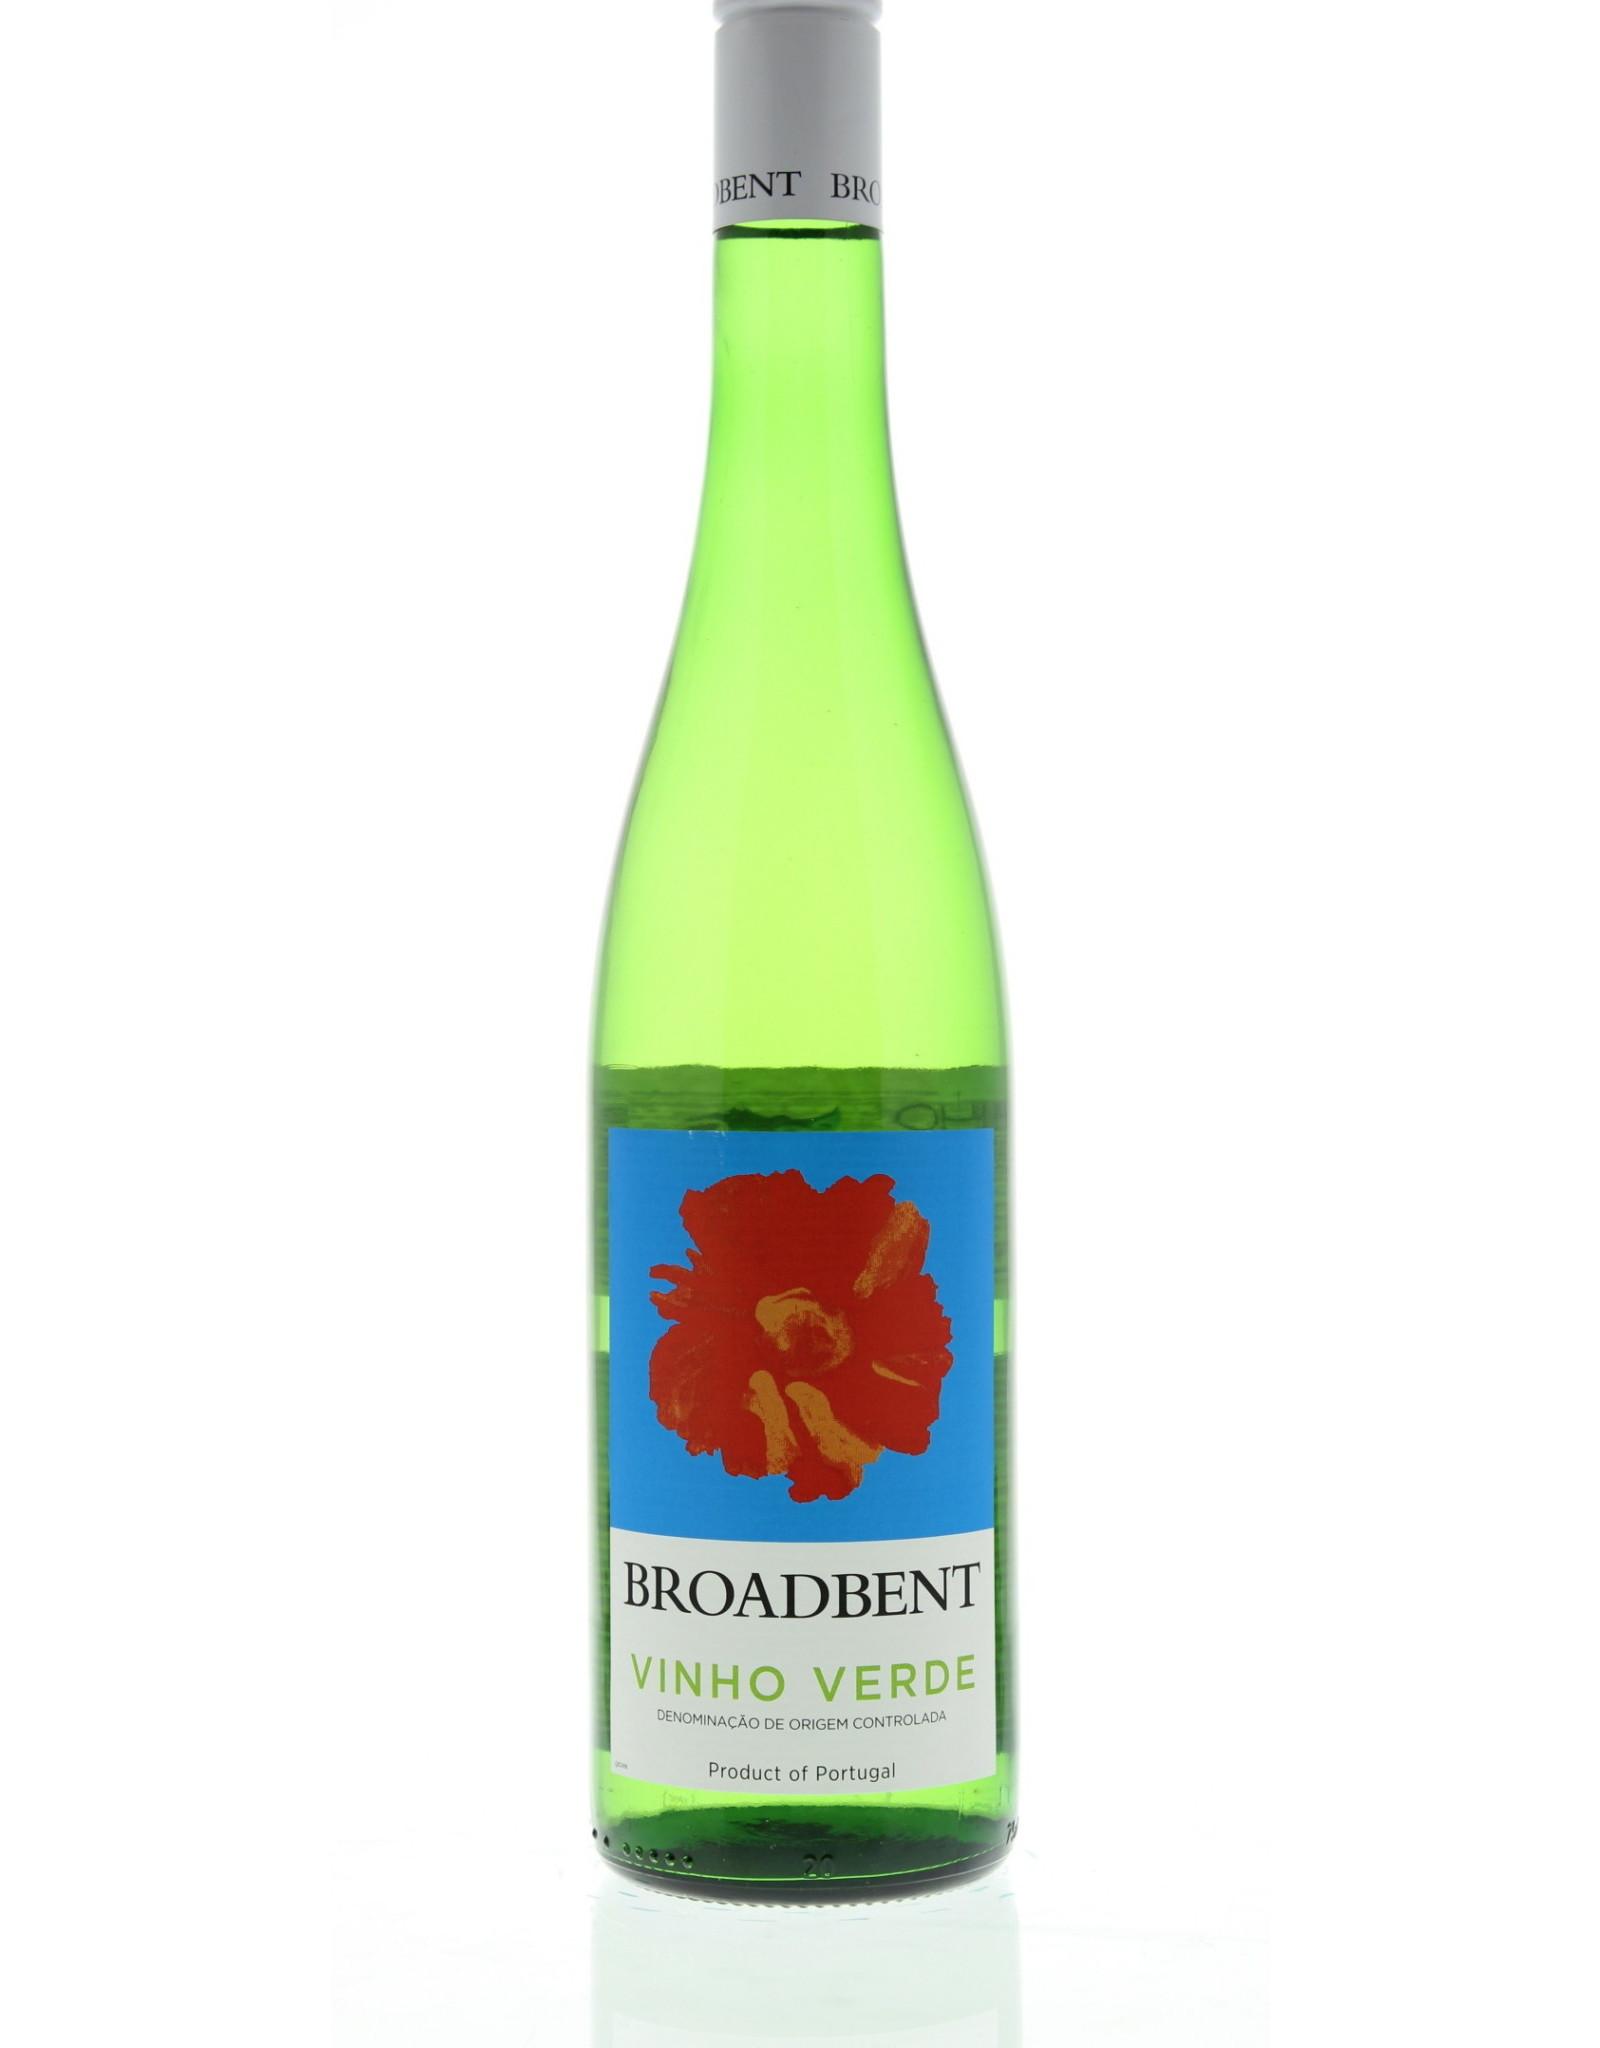 Broadbent Vinho Verde 2018